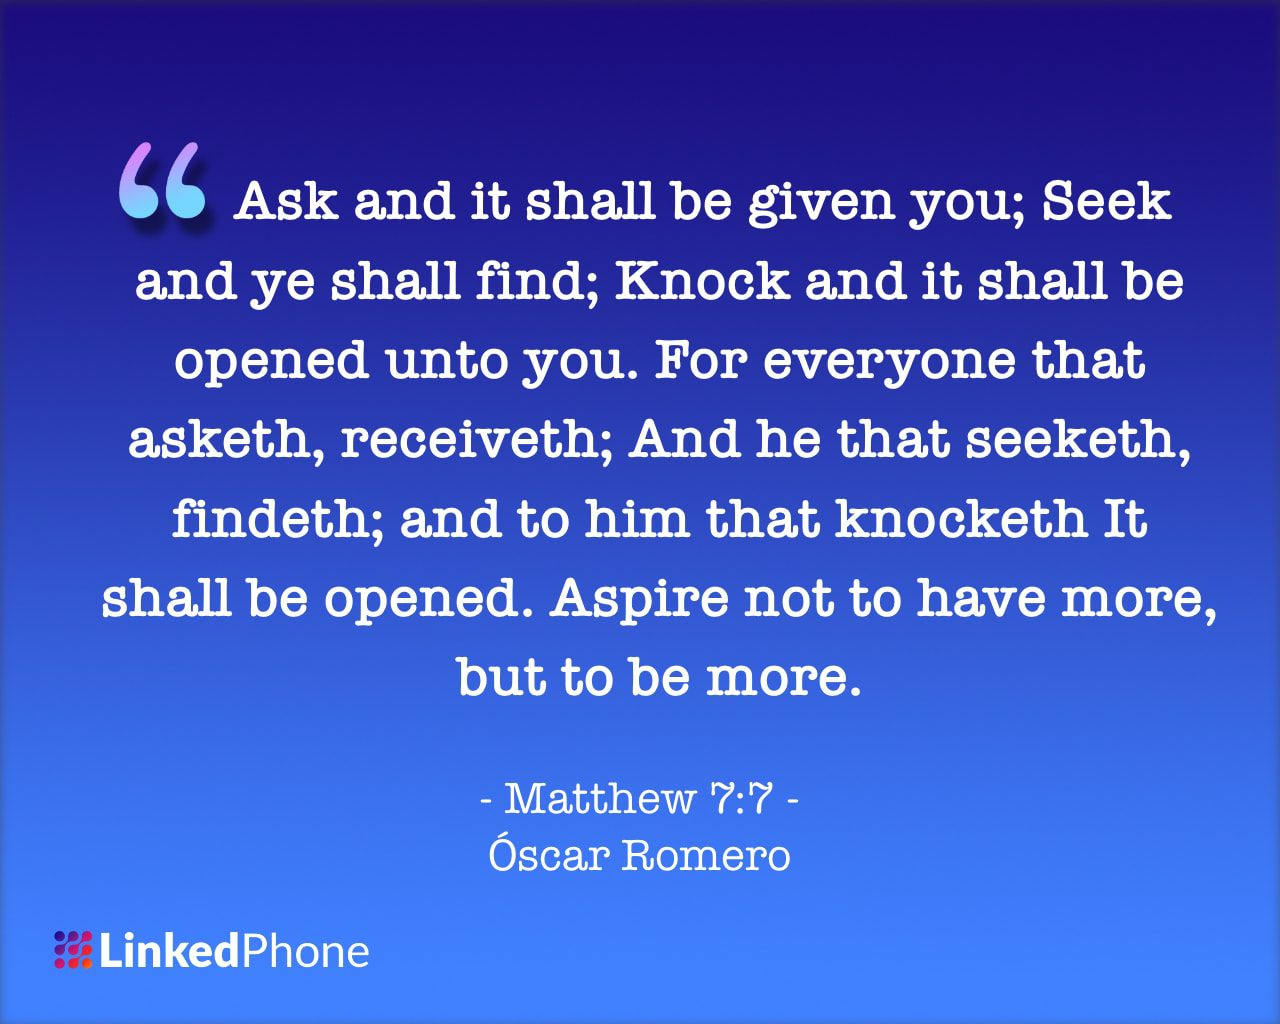 Matthew 7 Oscar Romero - Motivational Inspirational Quotes and Sayings